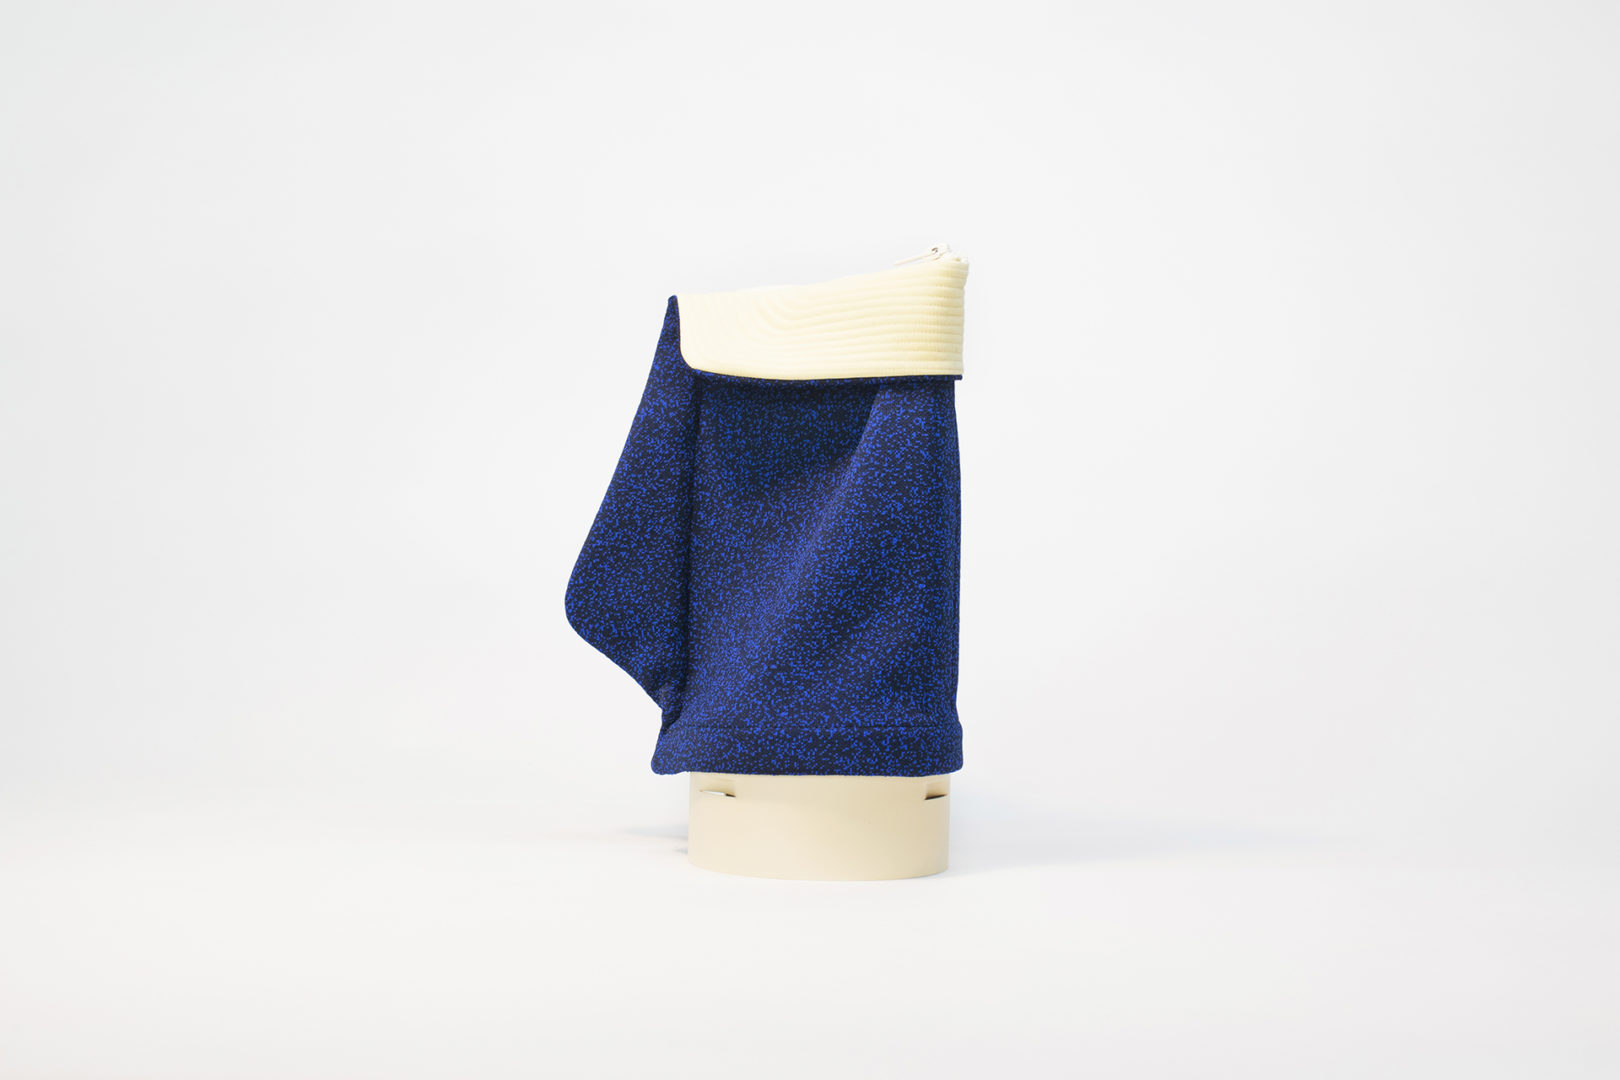 Muette-lamp-blue-Yvan-Caillaud